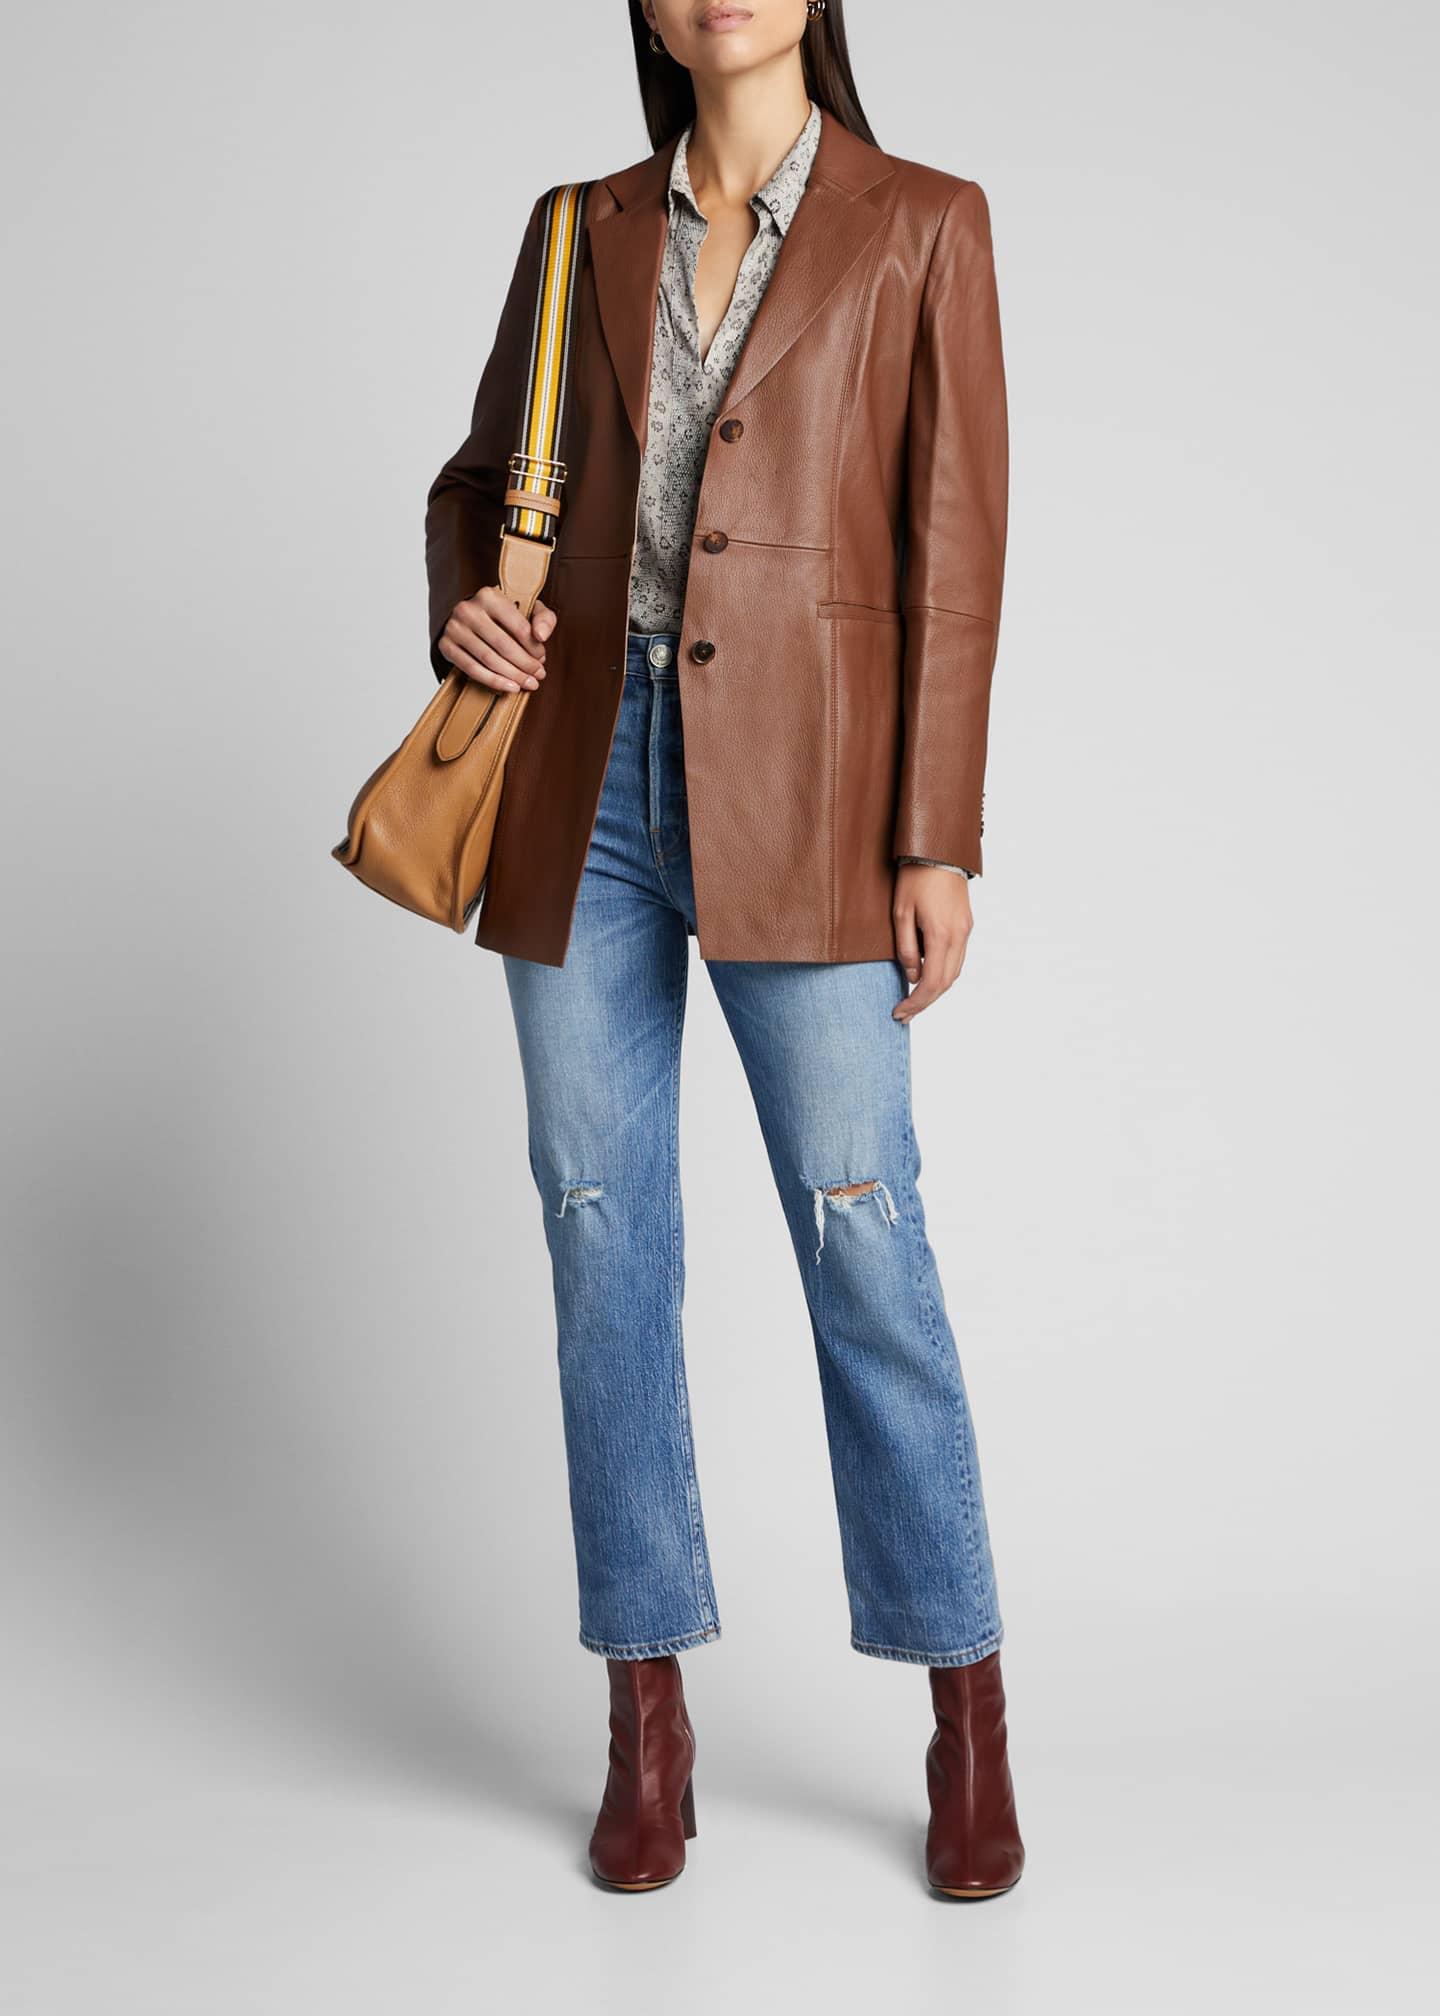 Lafayette 148 New York Jaqueline Lambskin Leather Blazer